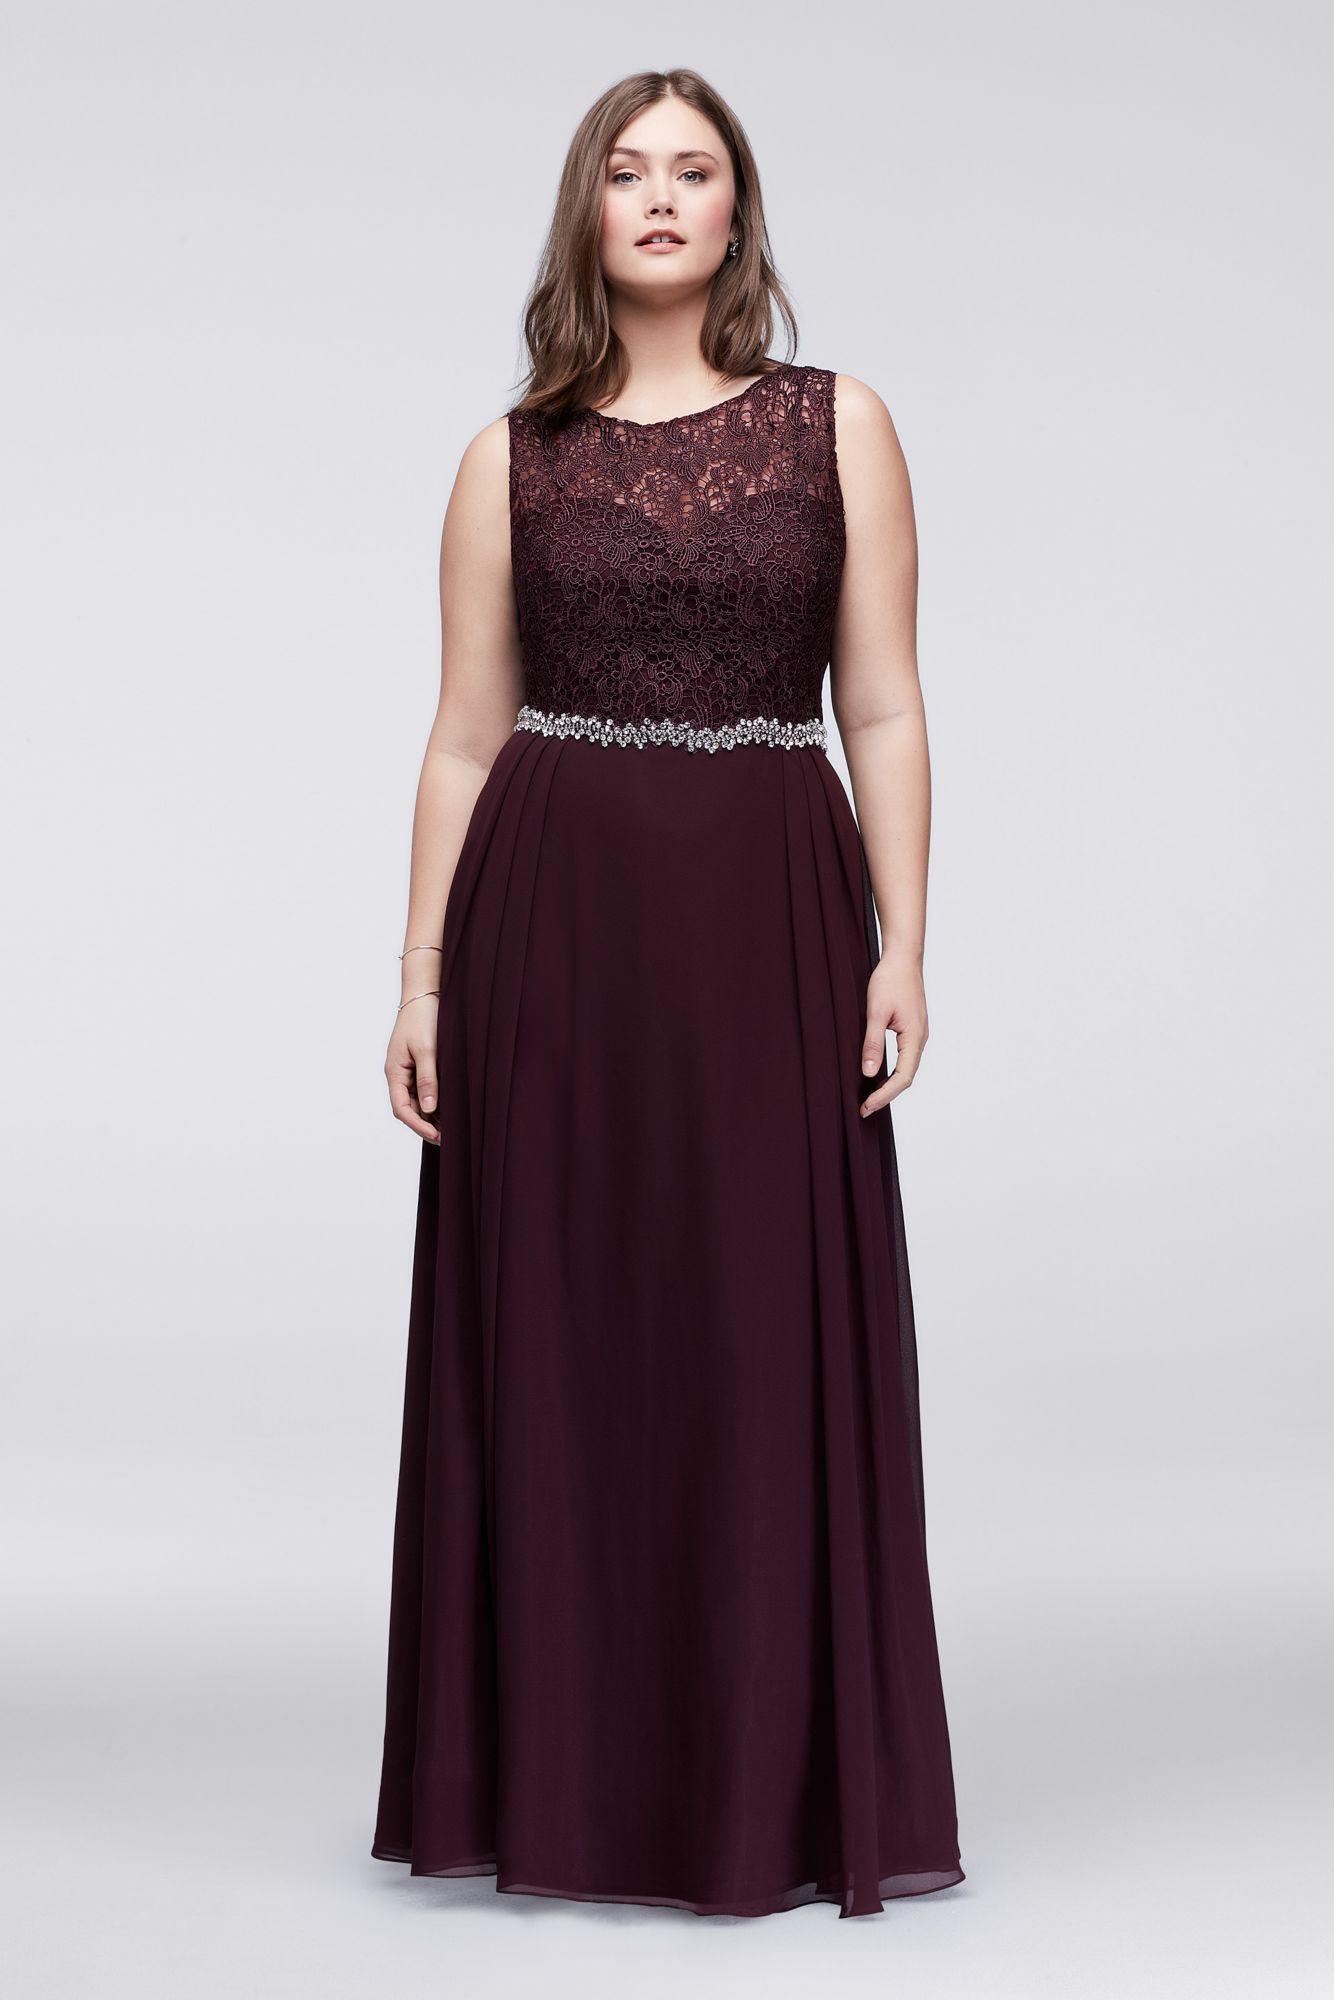 Plus size dw long aline lace and chiffon party gown dresses